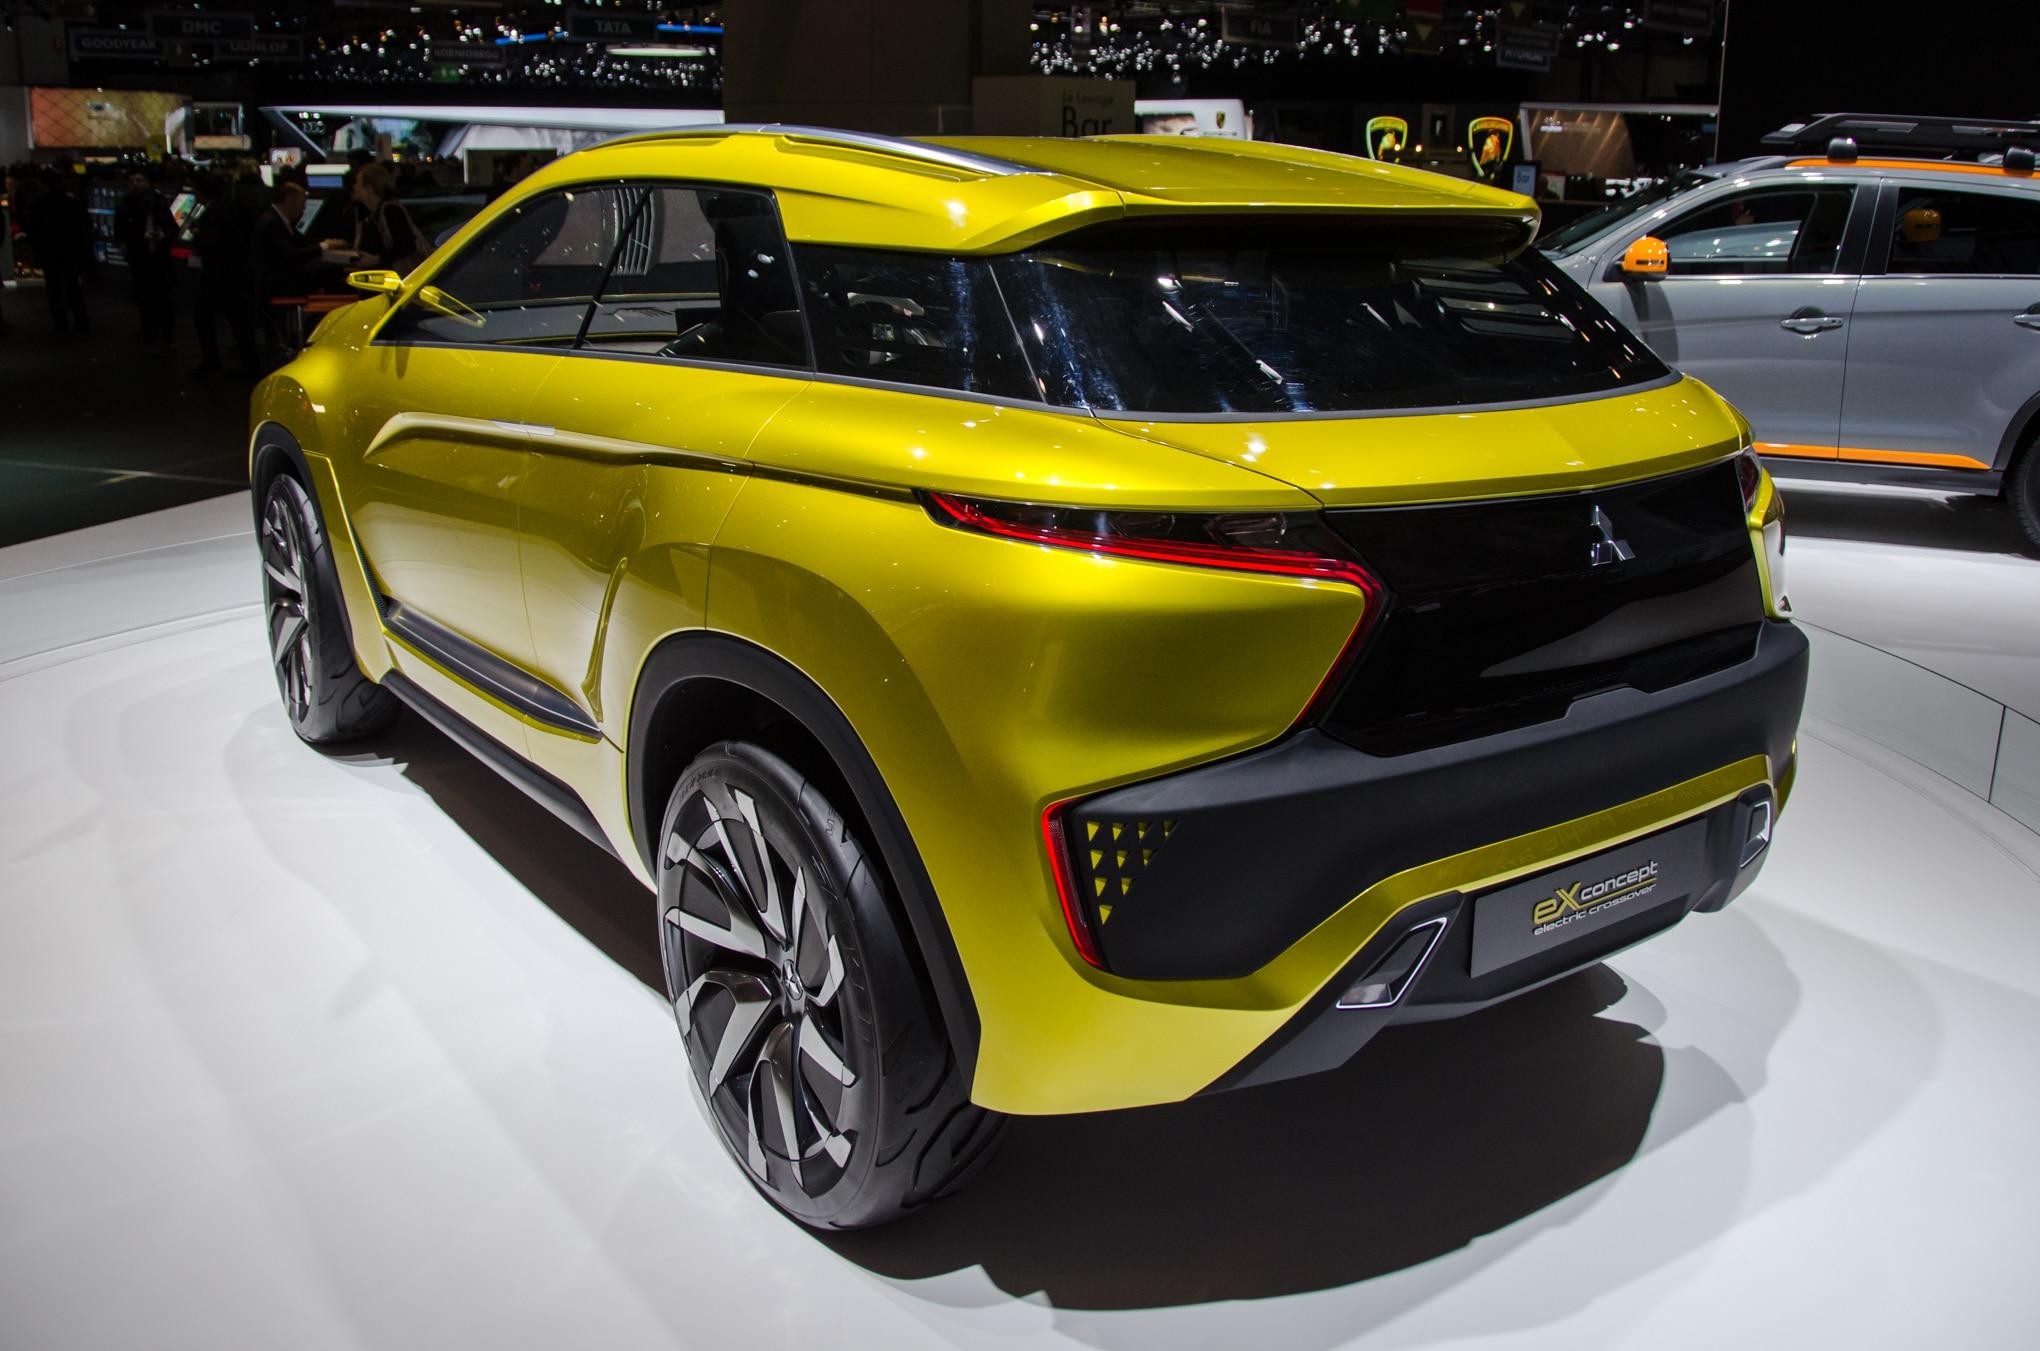 Mitsubishi Teases New Crossover Model Ahead of Geneva | Automobile Magazine